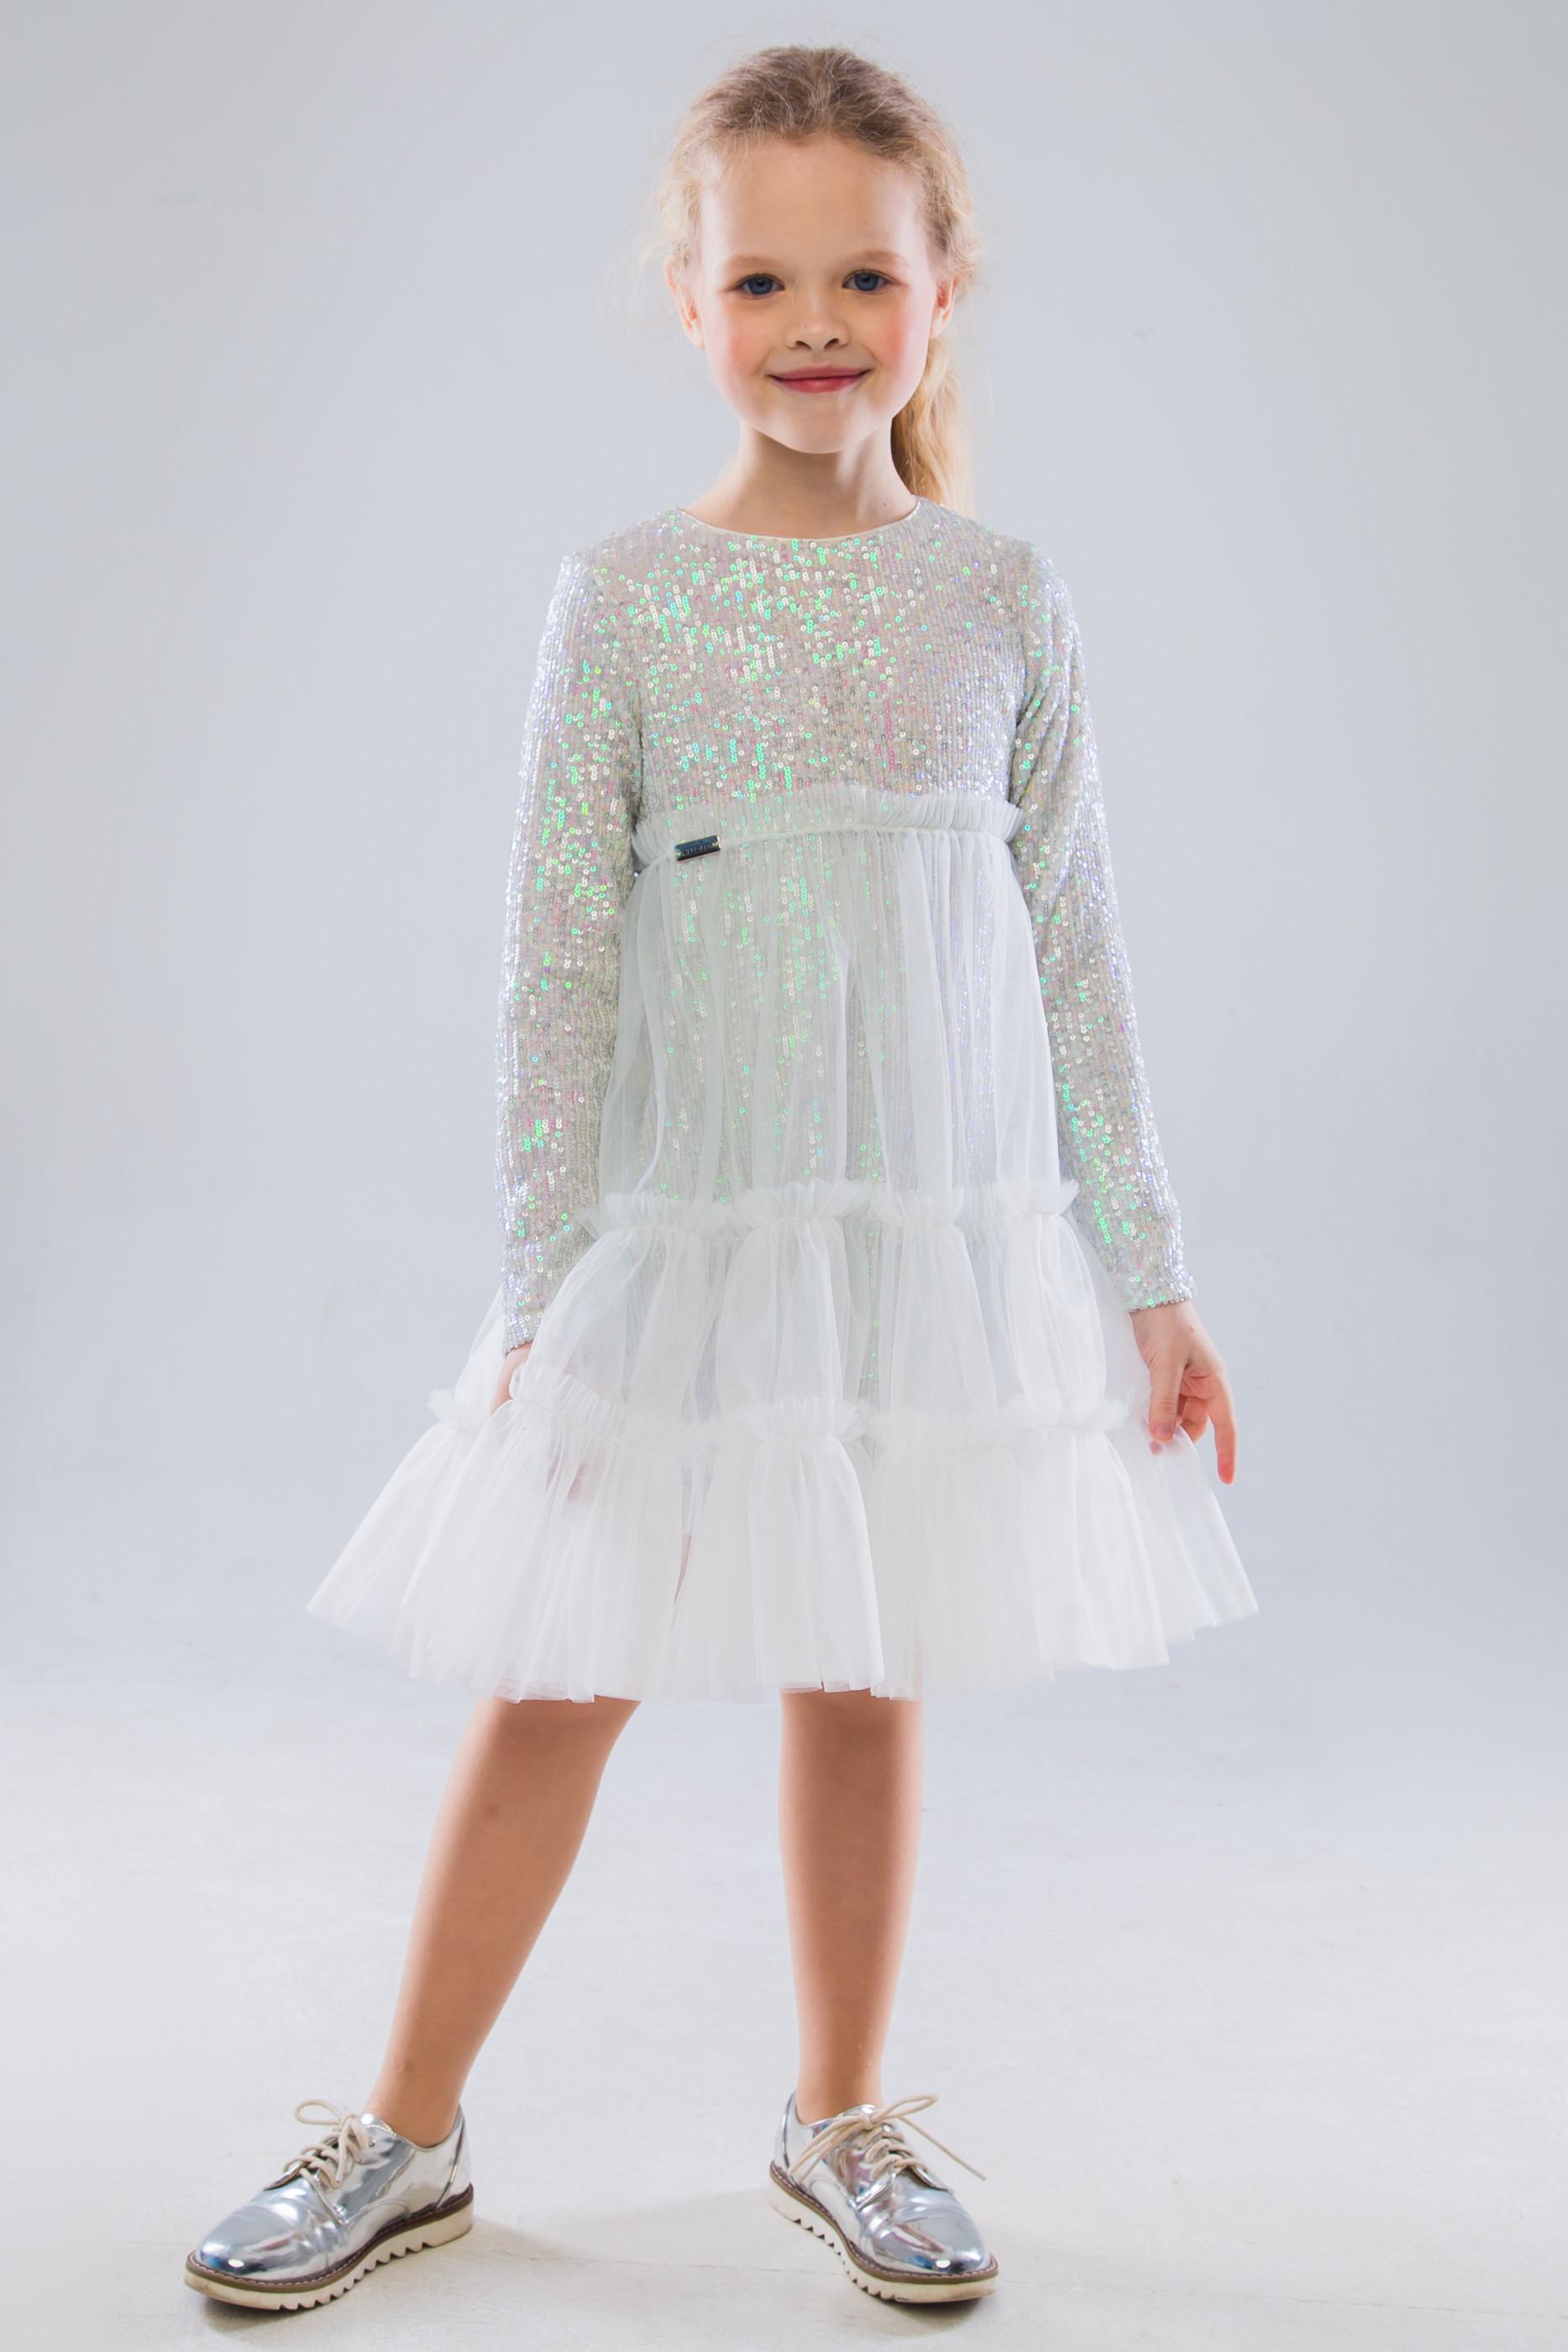 Плаття Андріана, фото №1